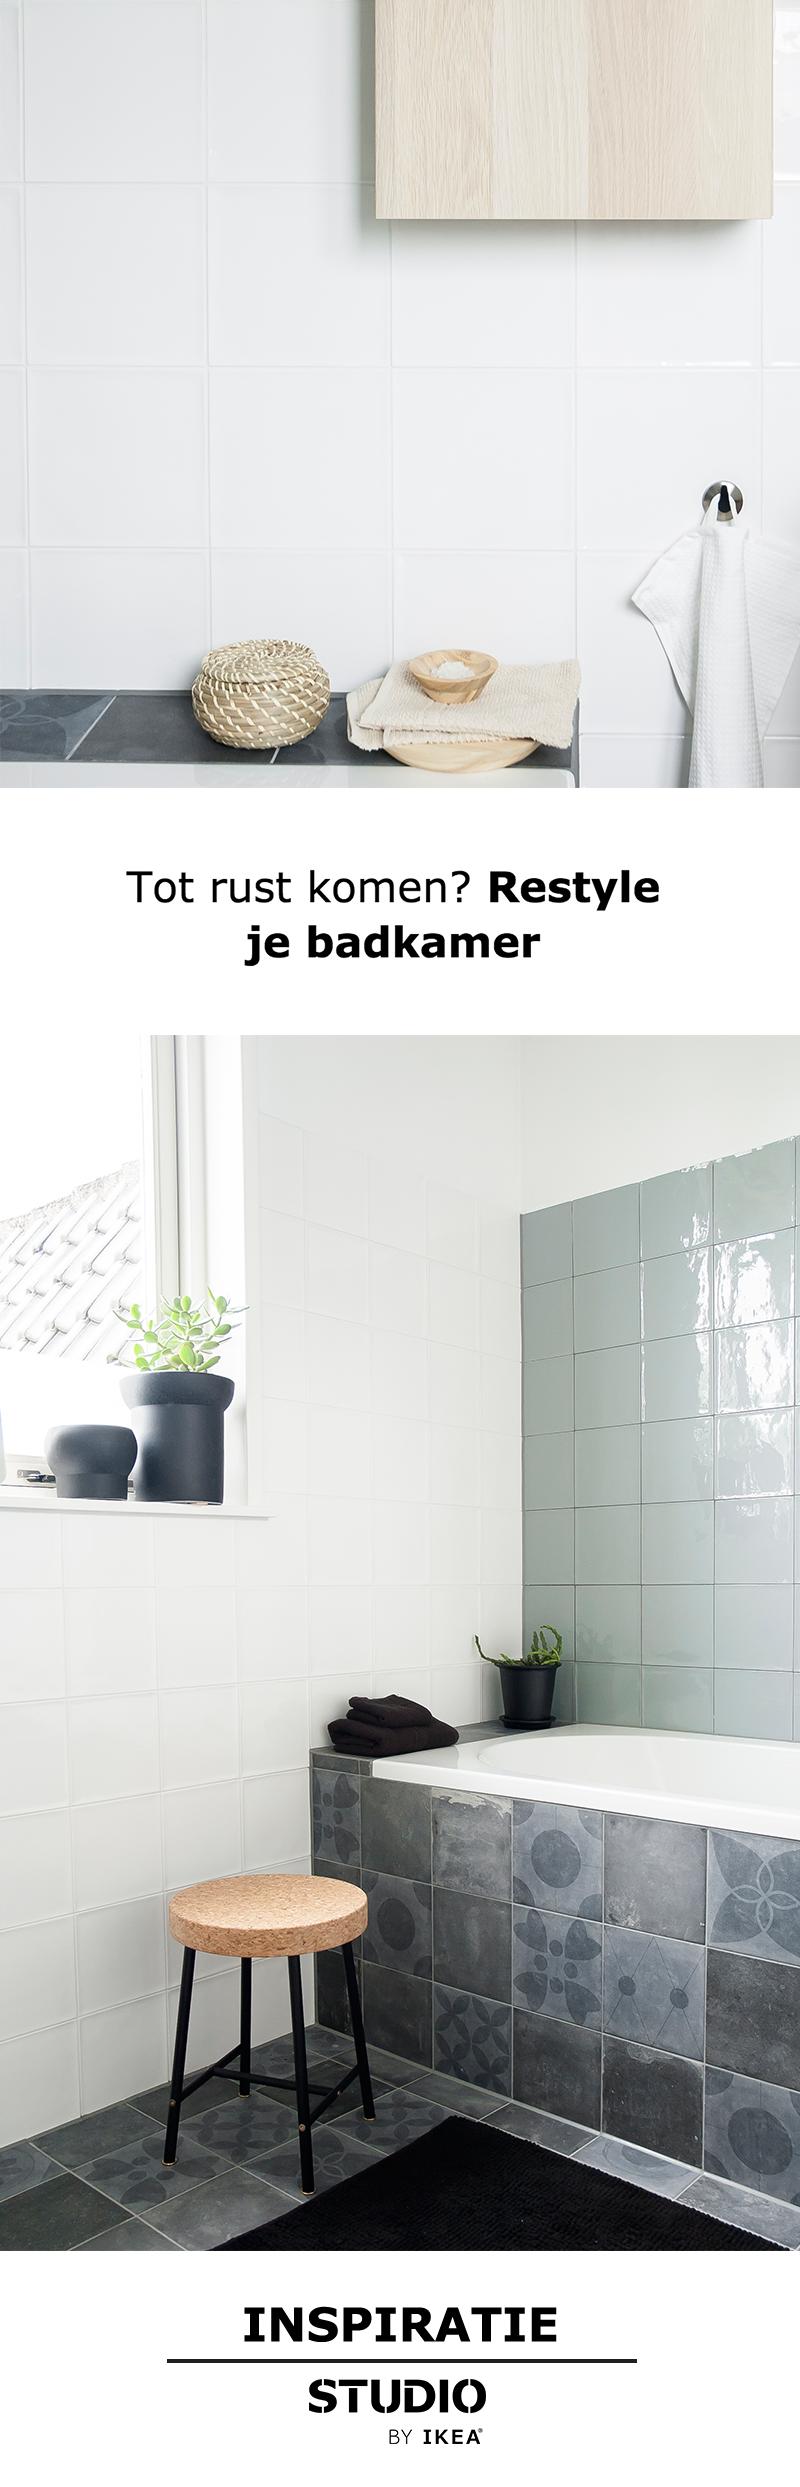 STUDIO by IKEA - Tot rust komen? Restyle je badkamer | #STUDIObyIKEA ...